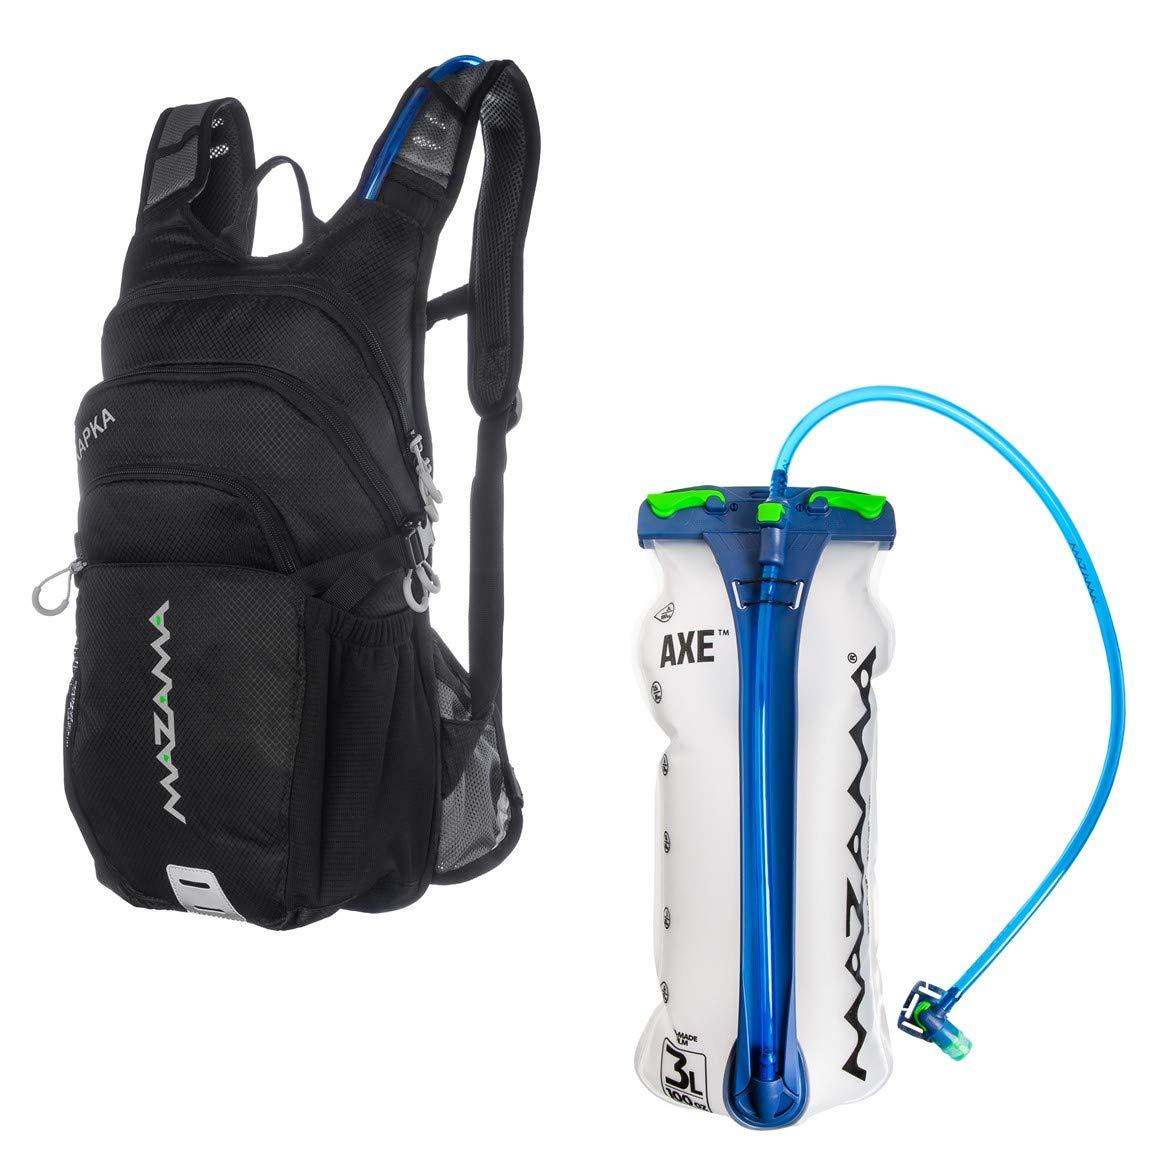 56c6ae89ce Amazon.com : Mazama Kapka Hydration Pack with 3 L Bladder (Black) : Sports  & Outdoors